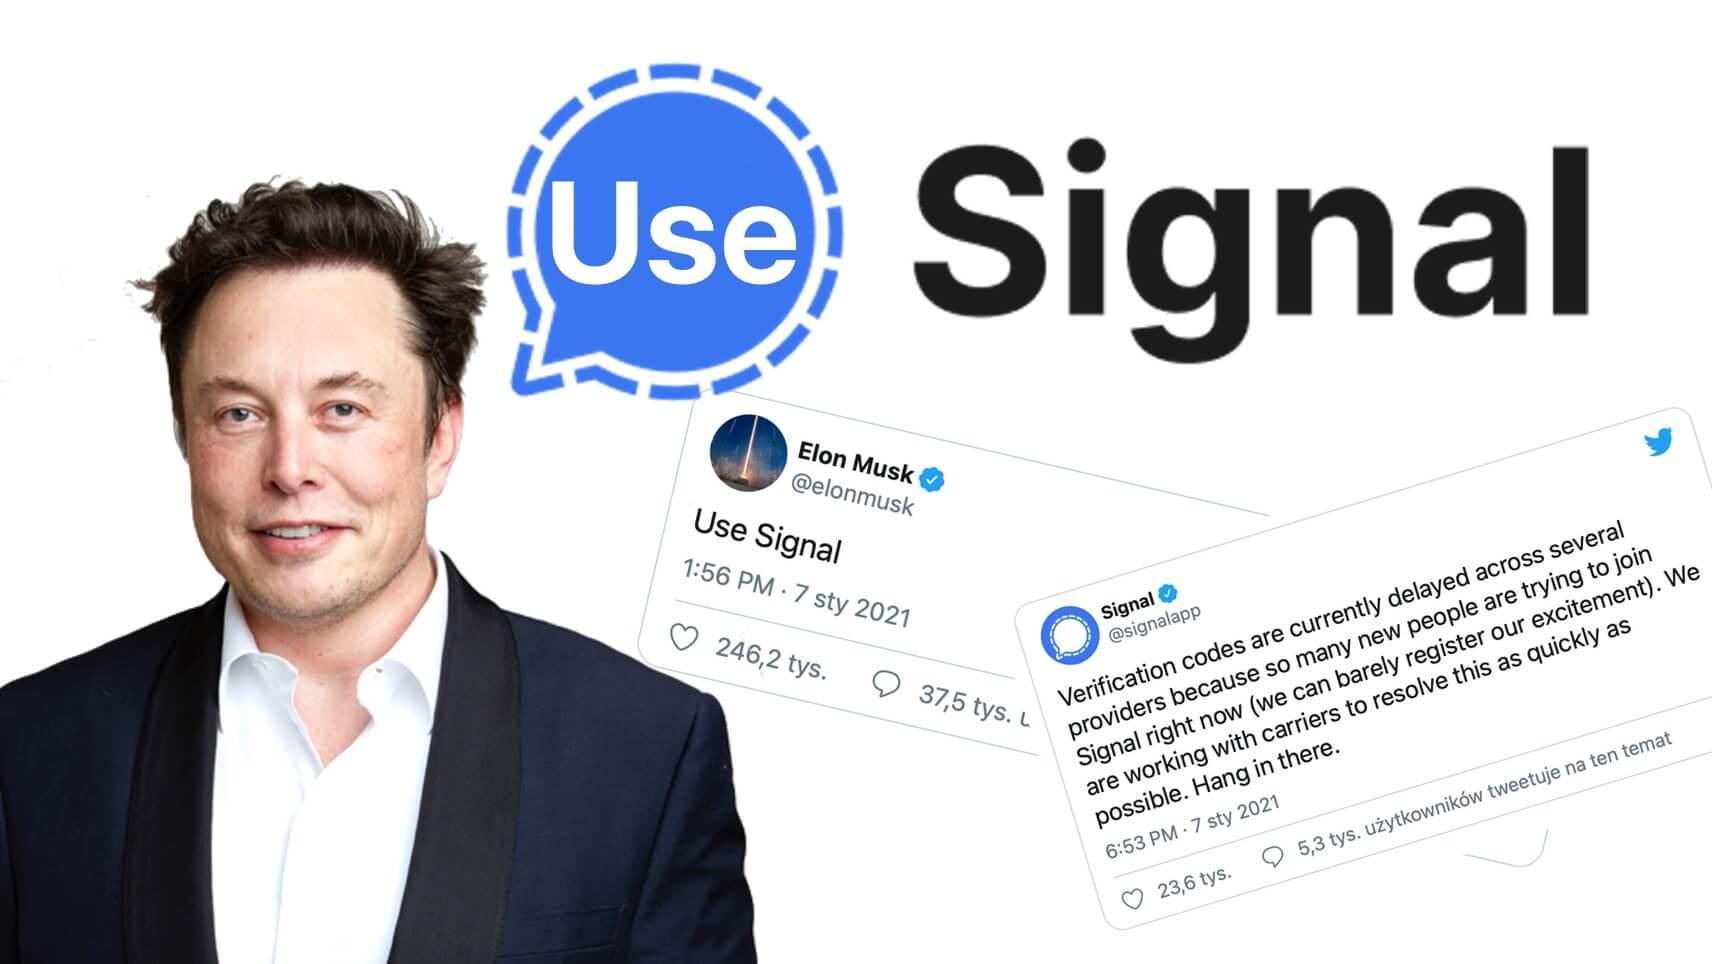 Elon Musk - Use Signal